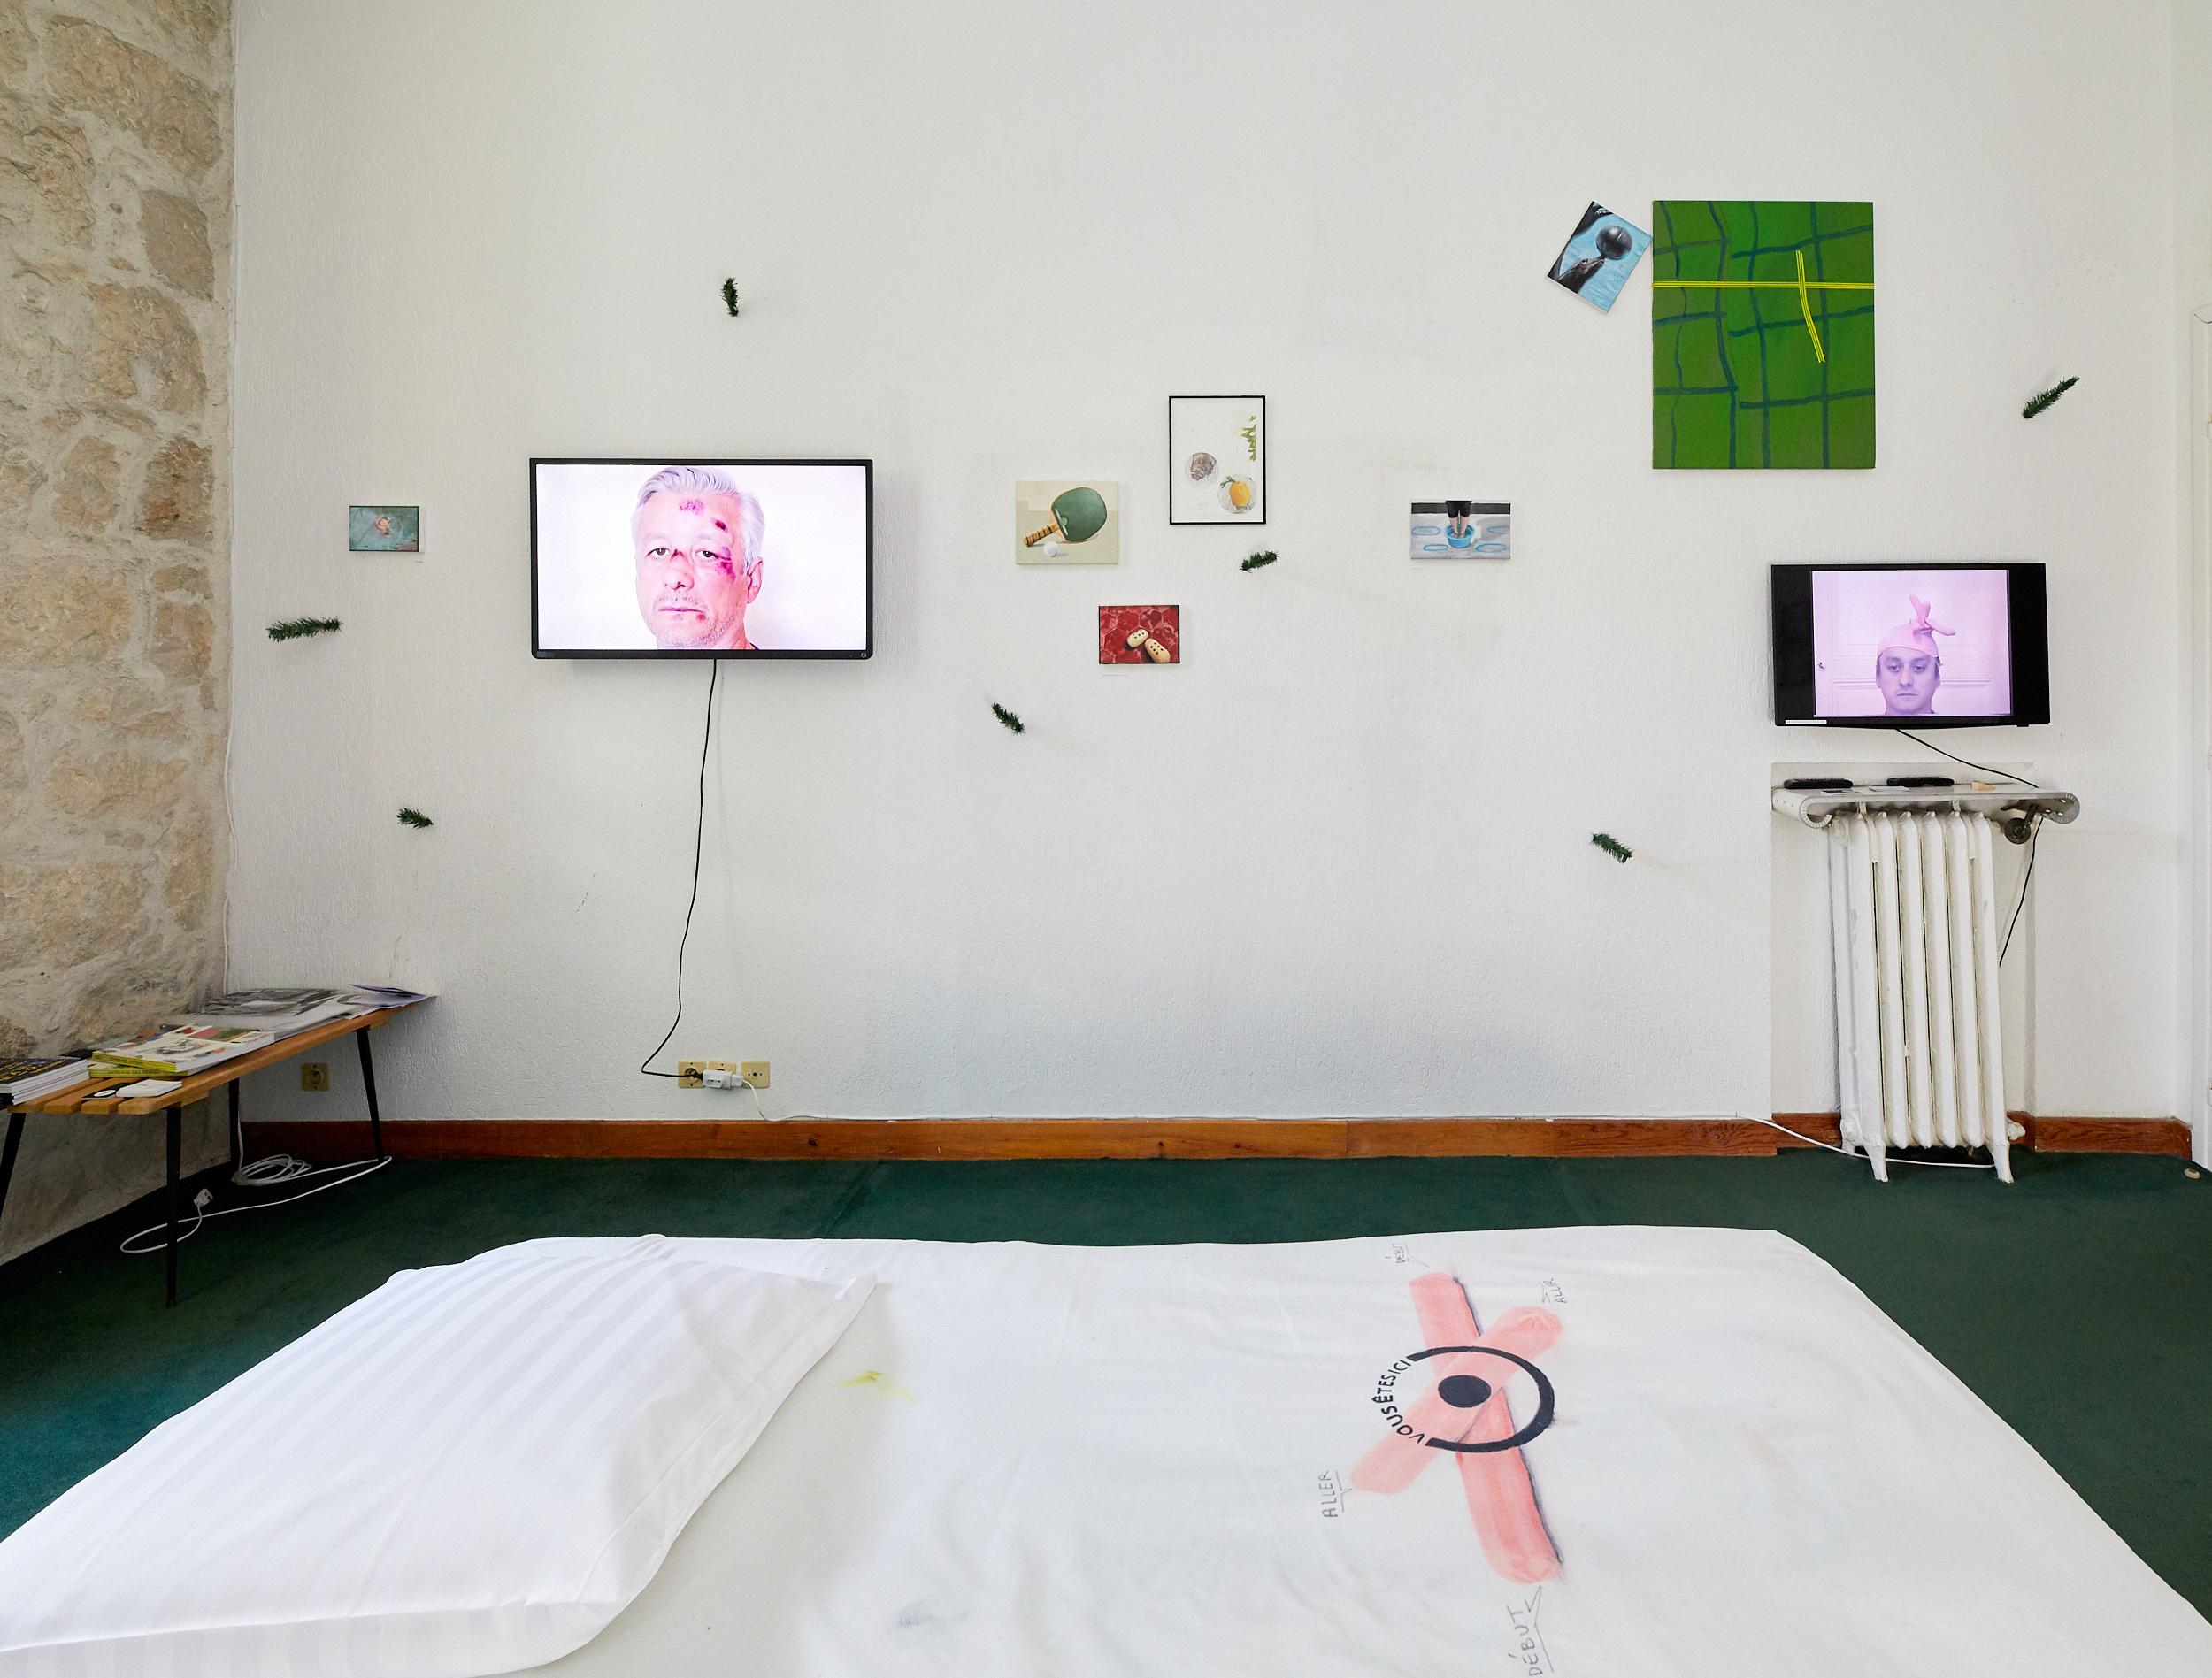 Thierry Lagalla, Espace à Vendre, 2019, camera camera